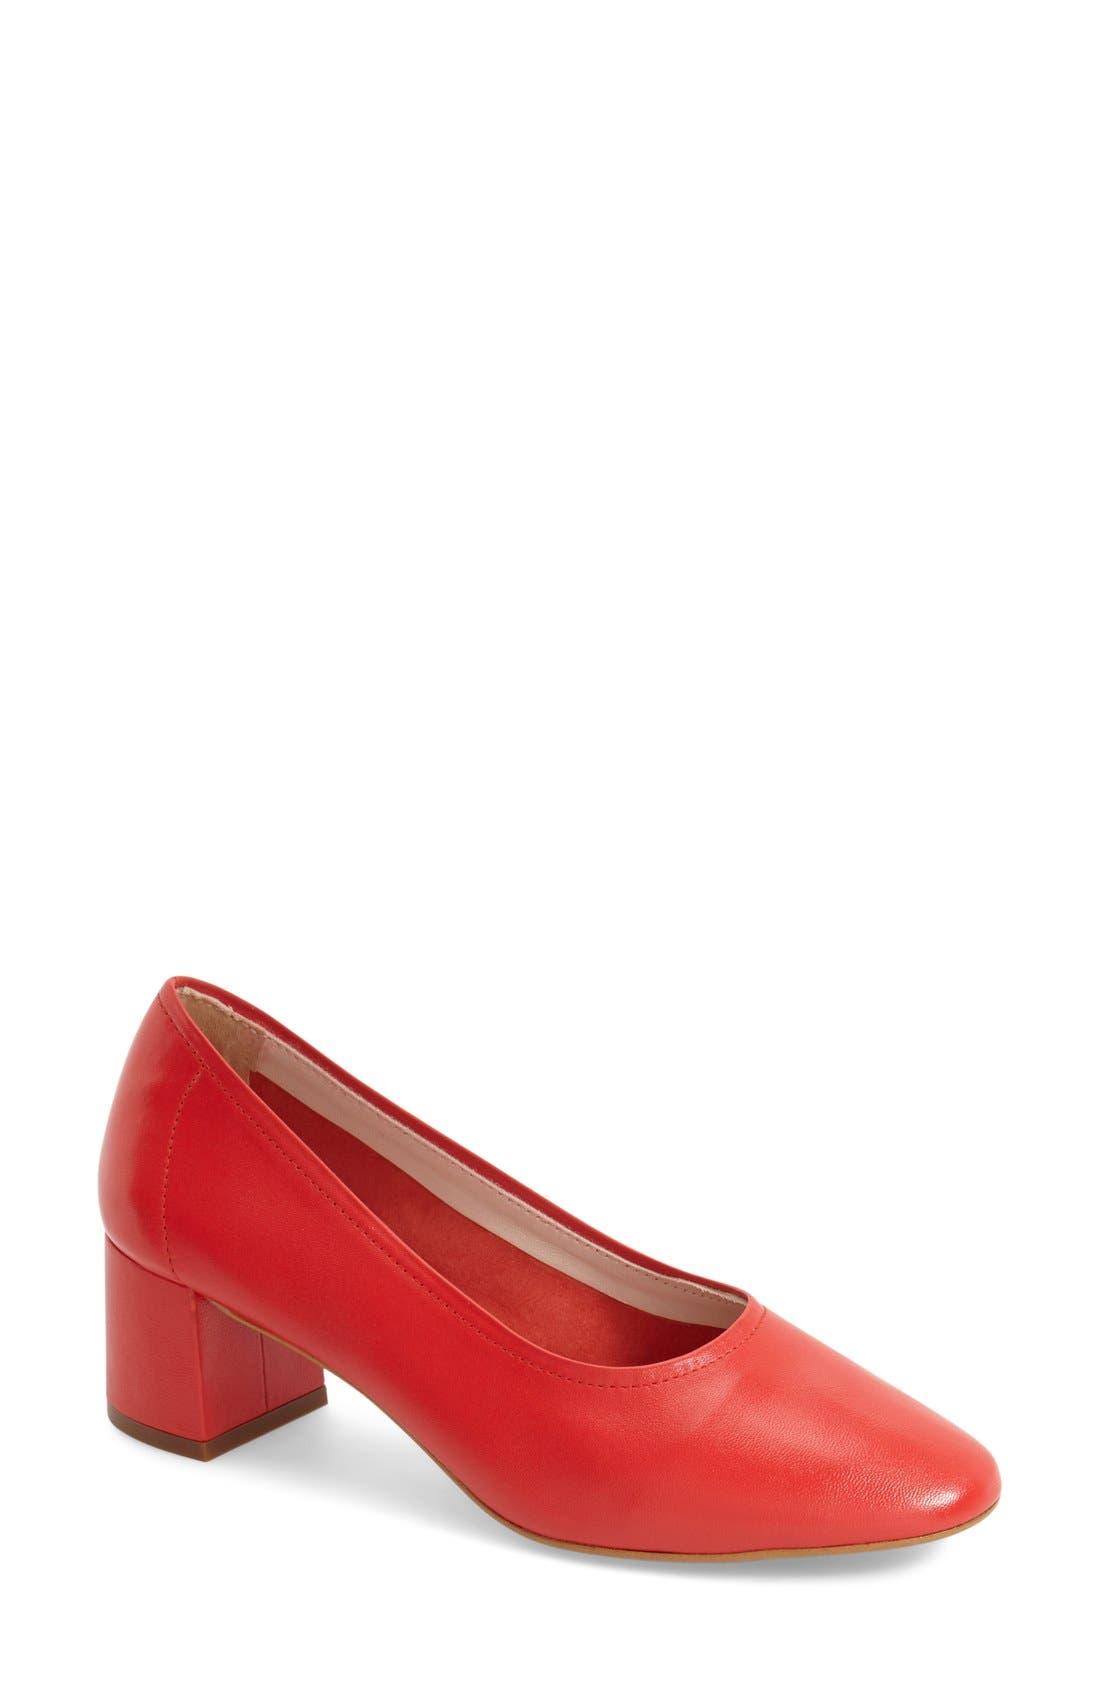 'Juno' Ballet Shoe,                             Main thumbnail 4, color,